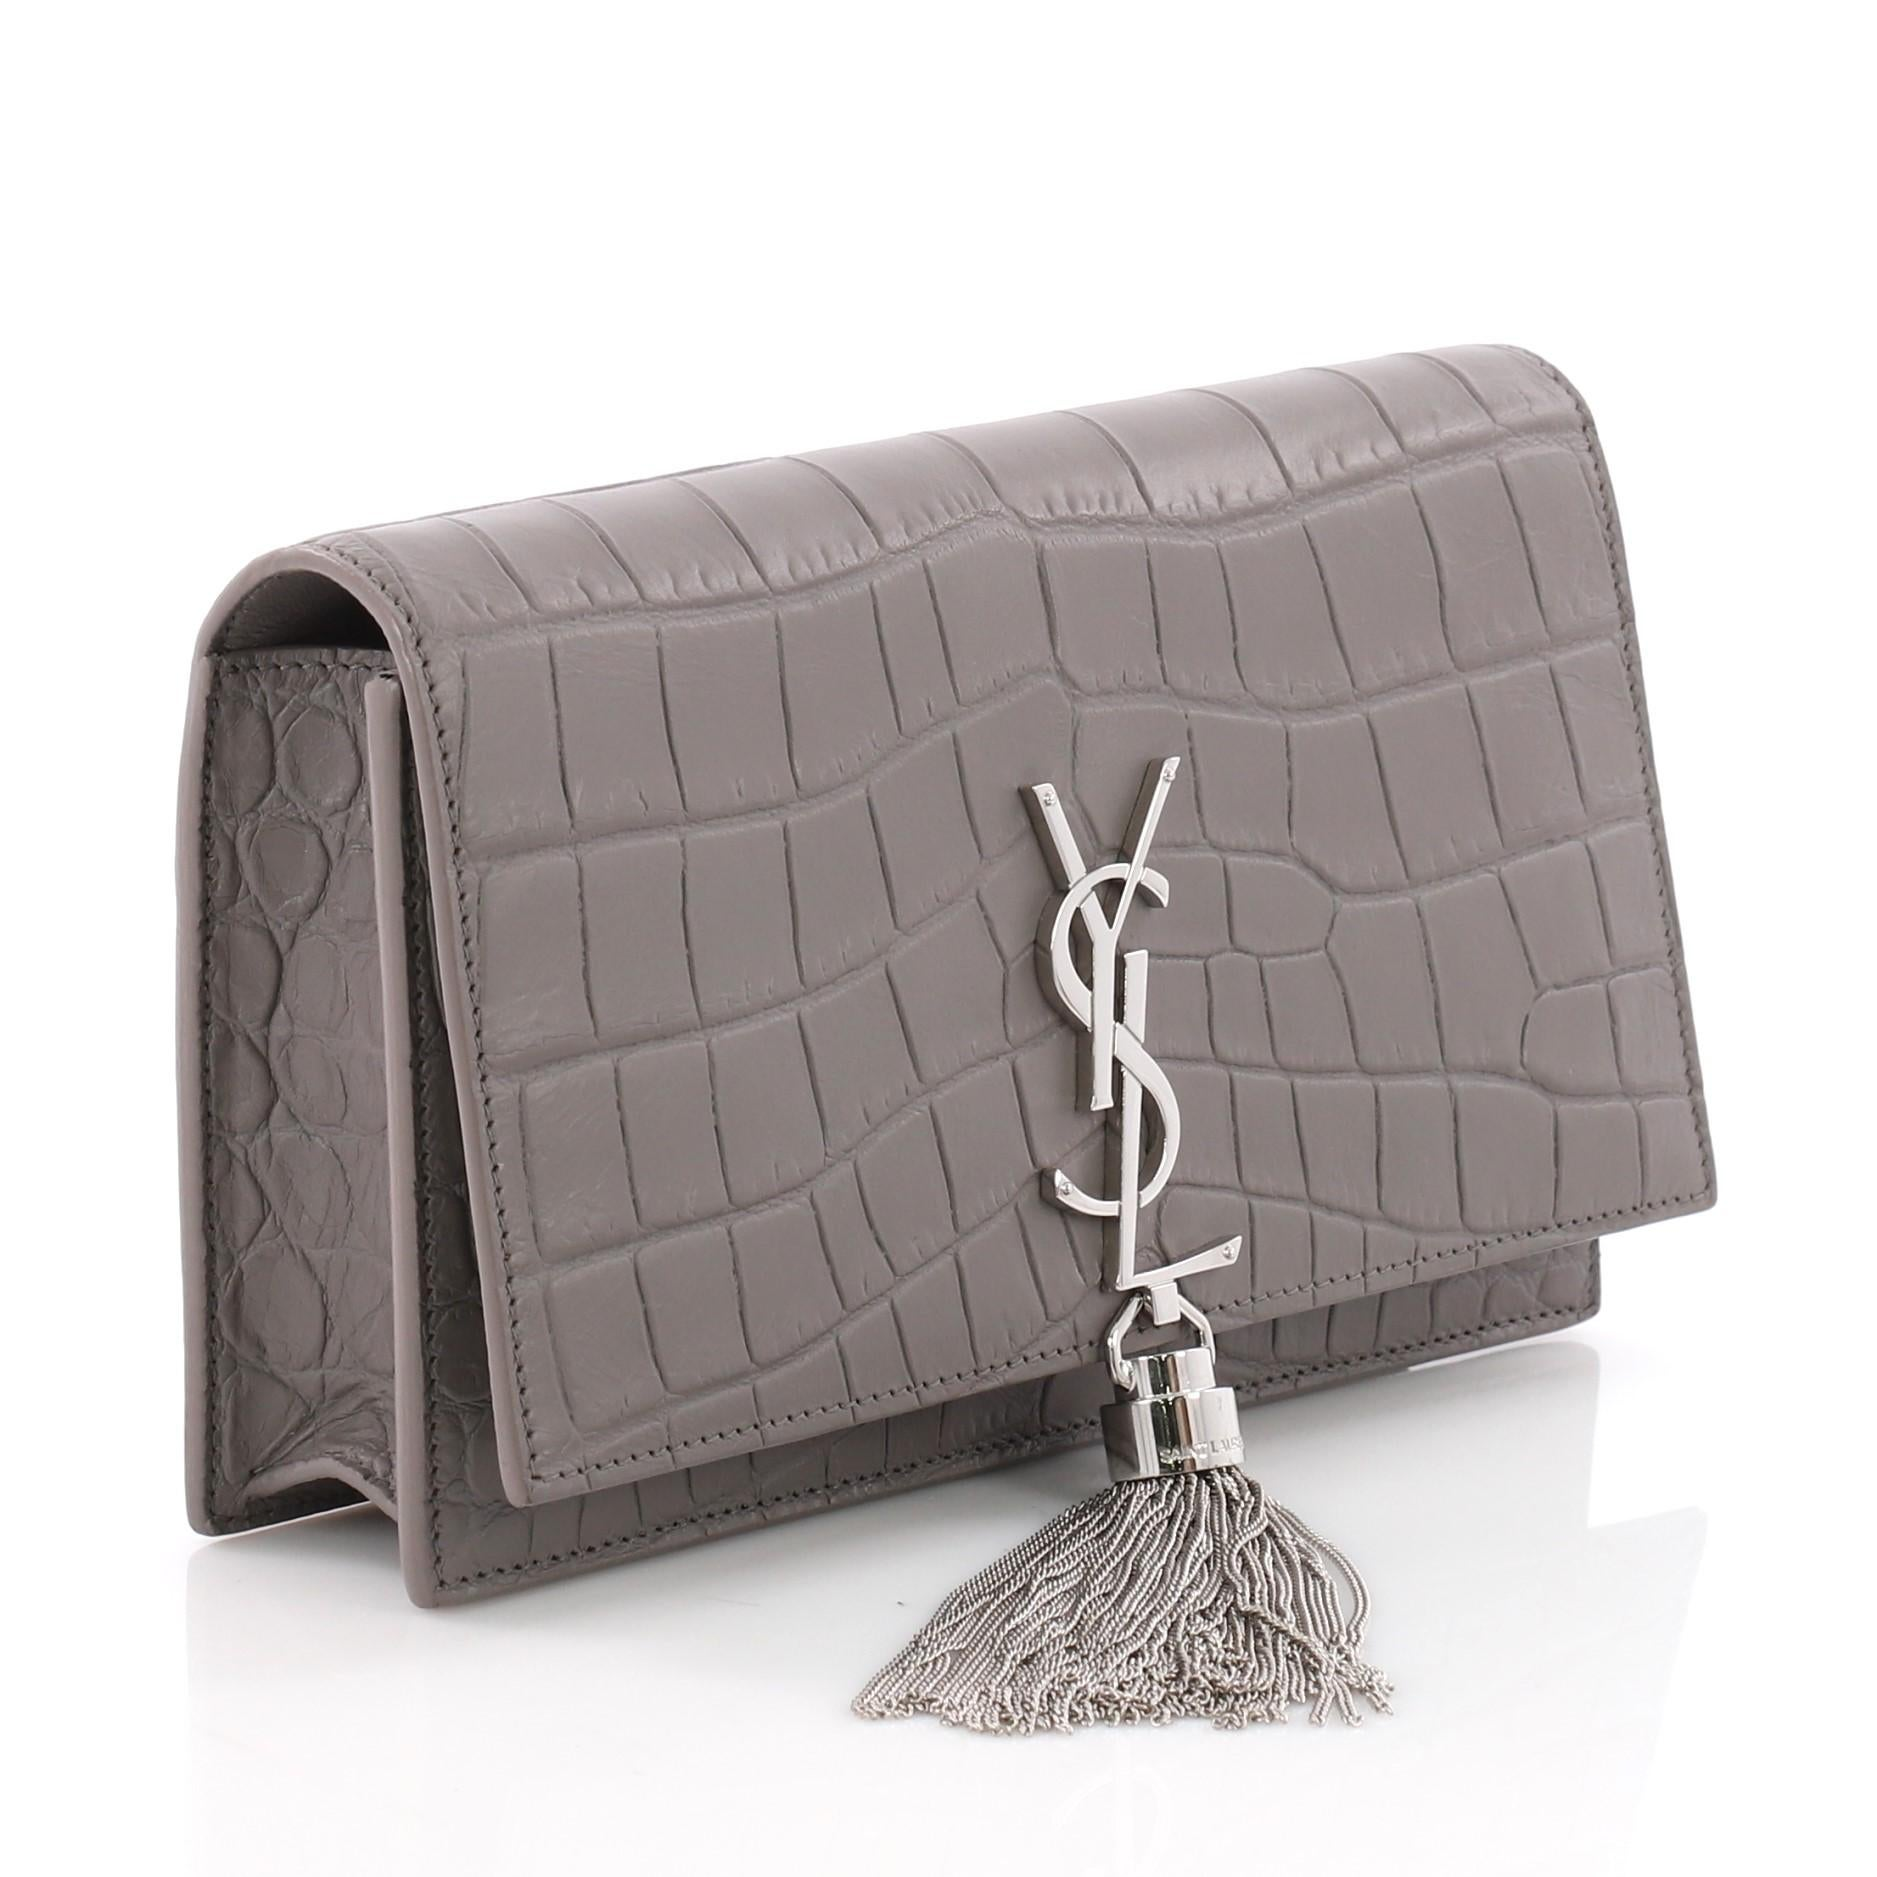 6eb43163bf Saint Laurent Classic Monogram Tassel Chain Wallet Crocodile Embossed  Leather